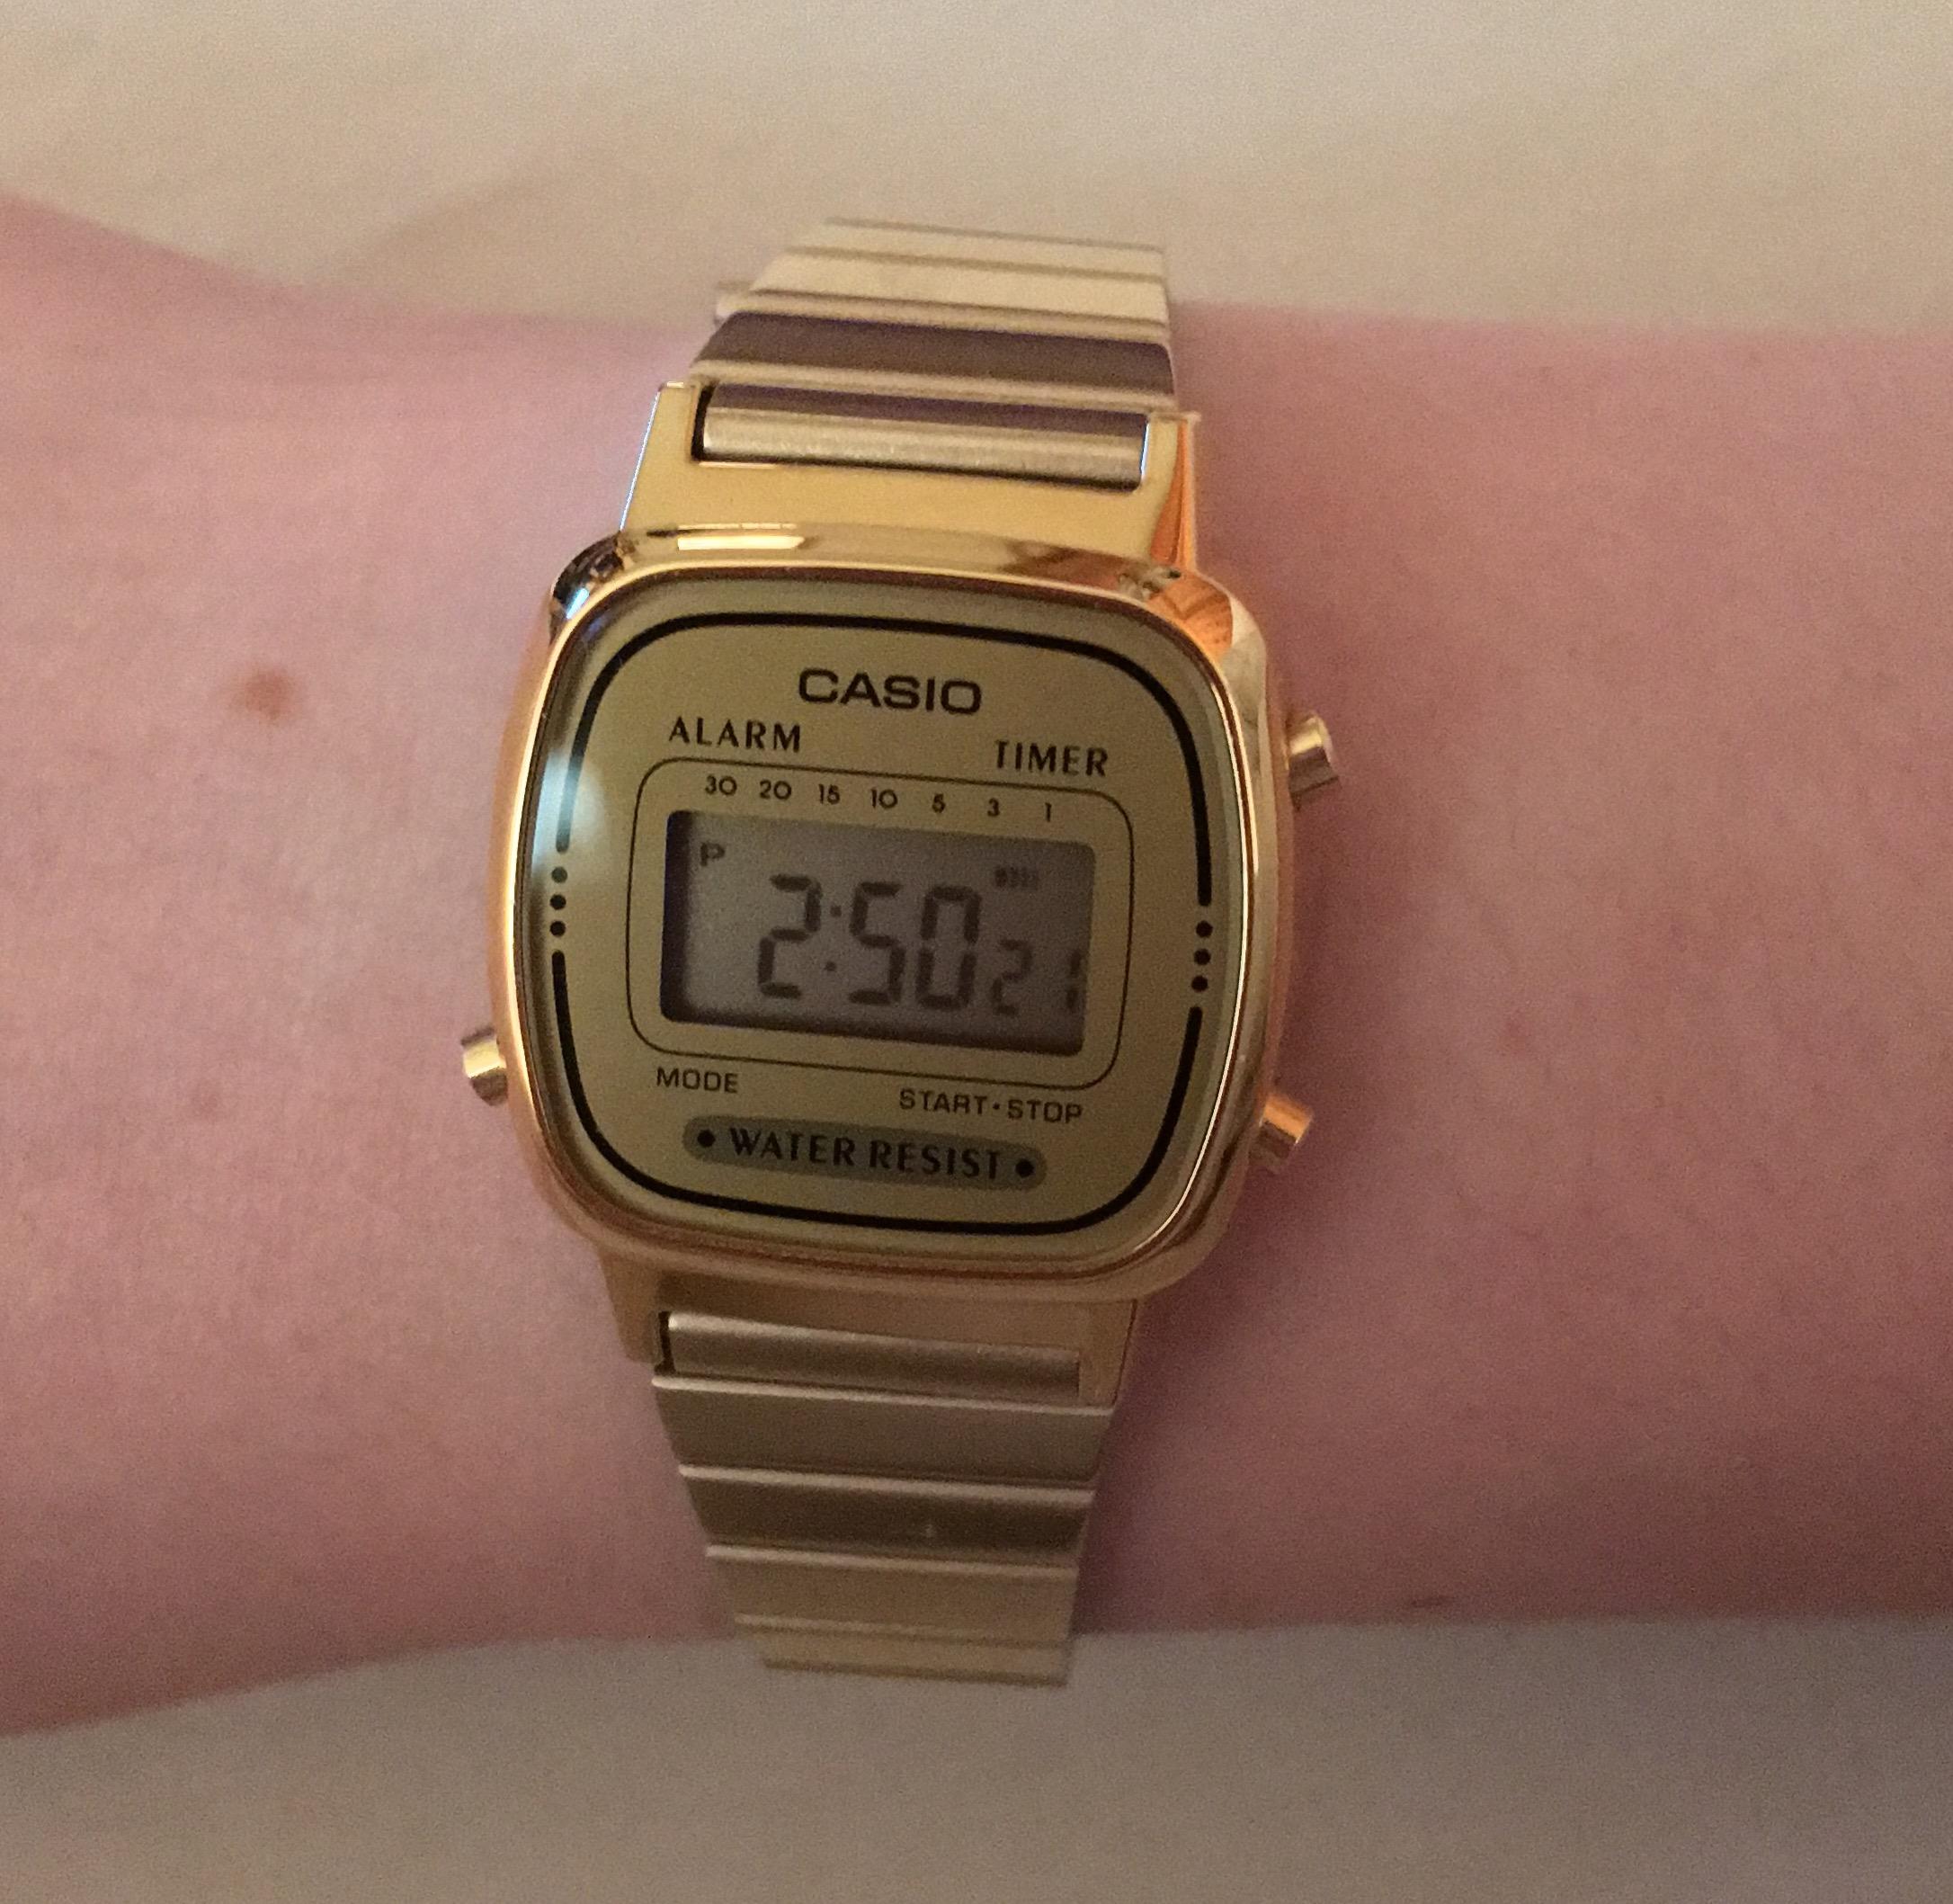 Casio Classic Collection Damenchronograph In Gold La670wega 9ef De